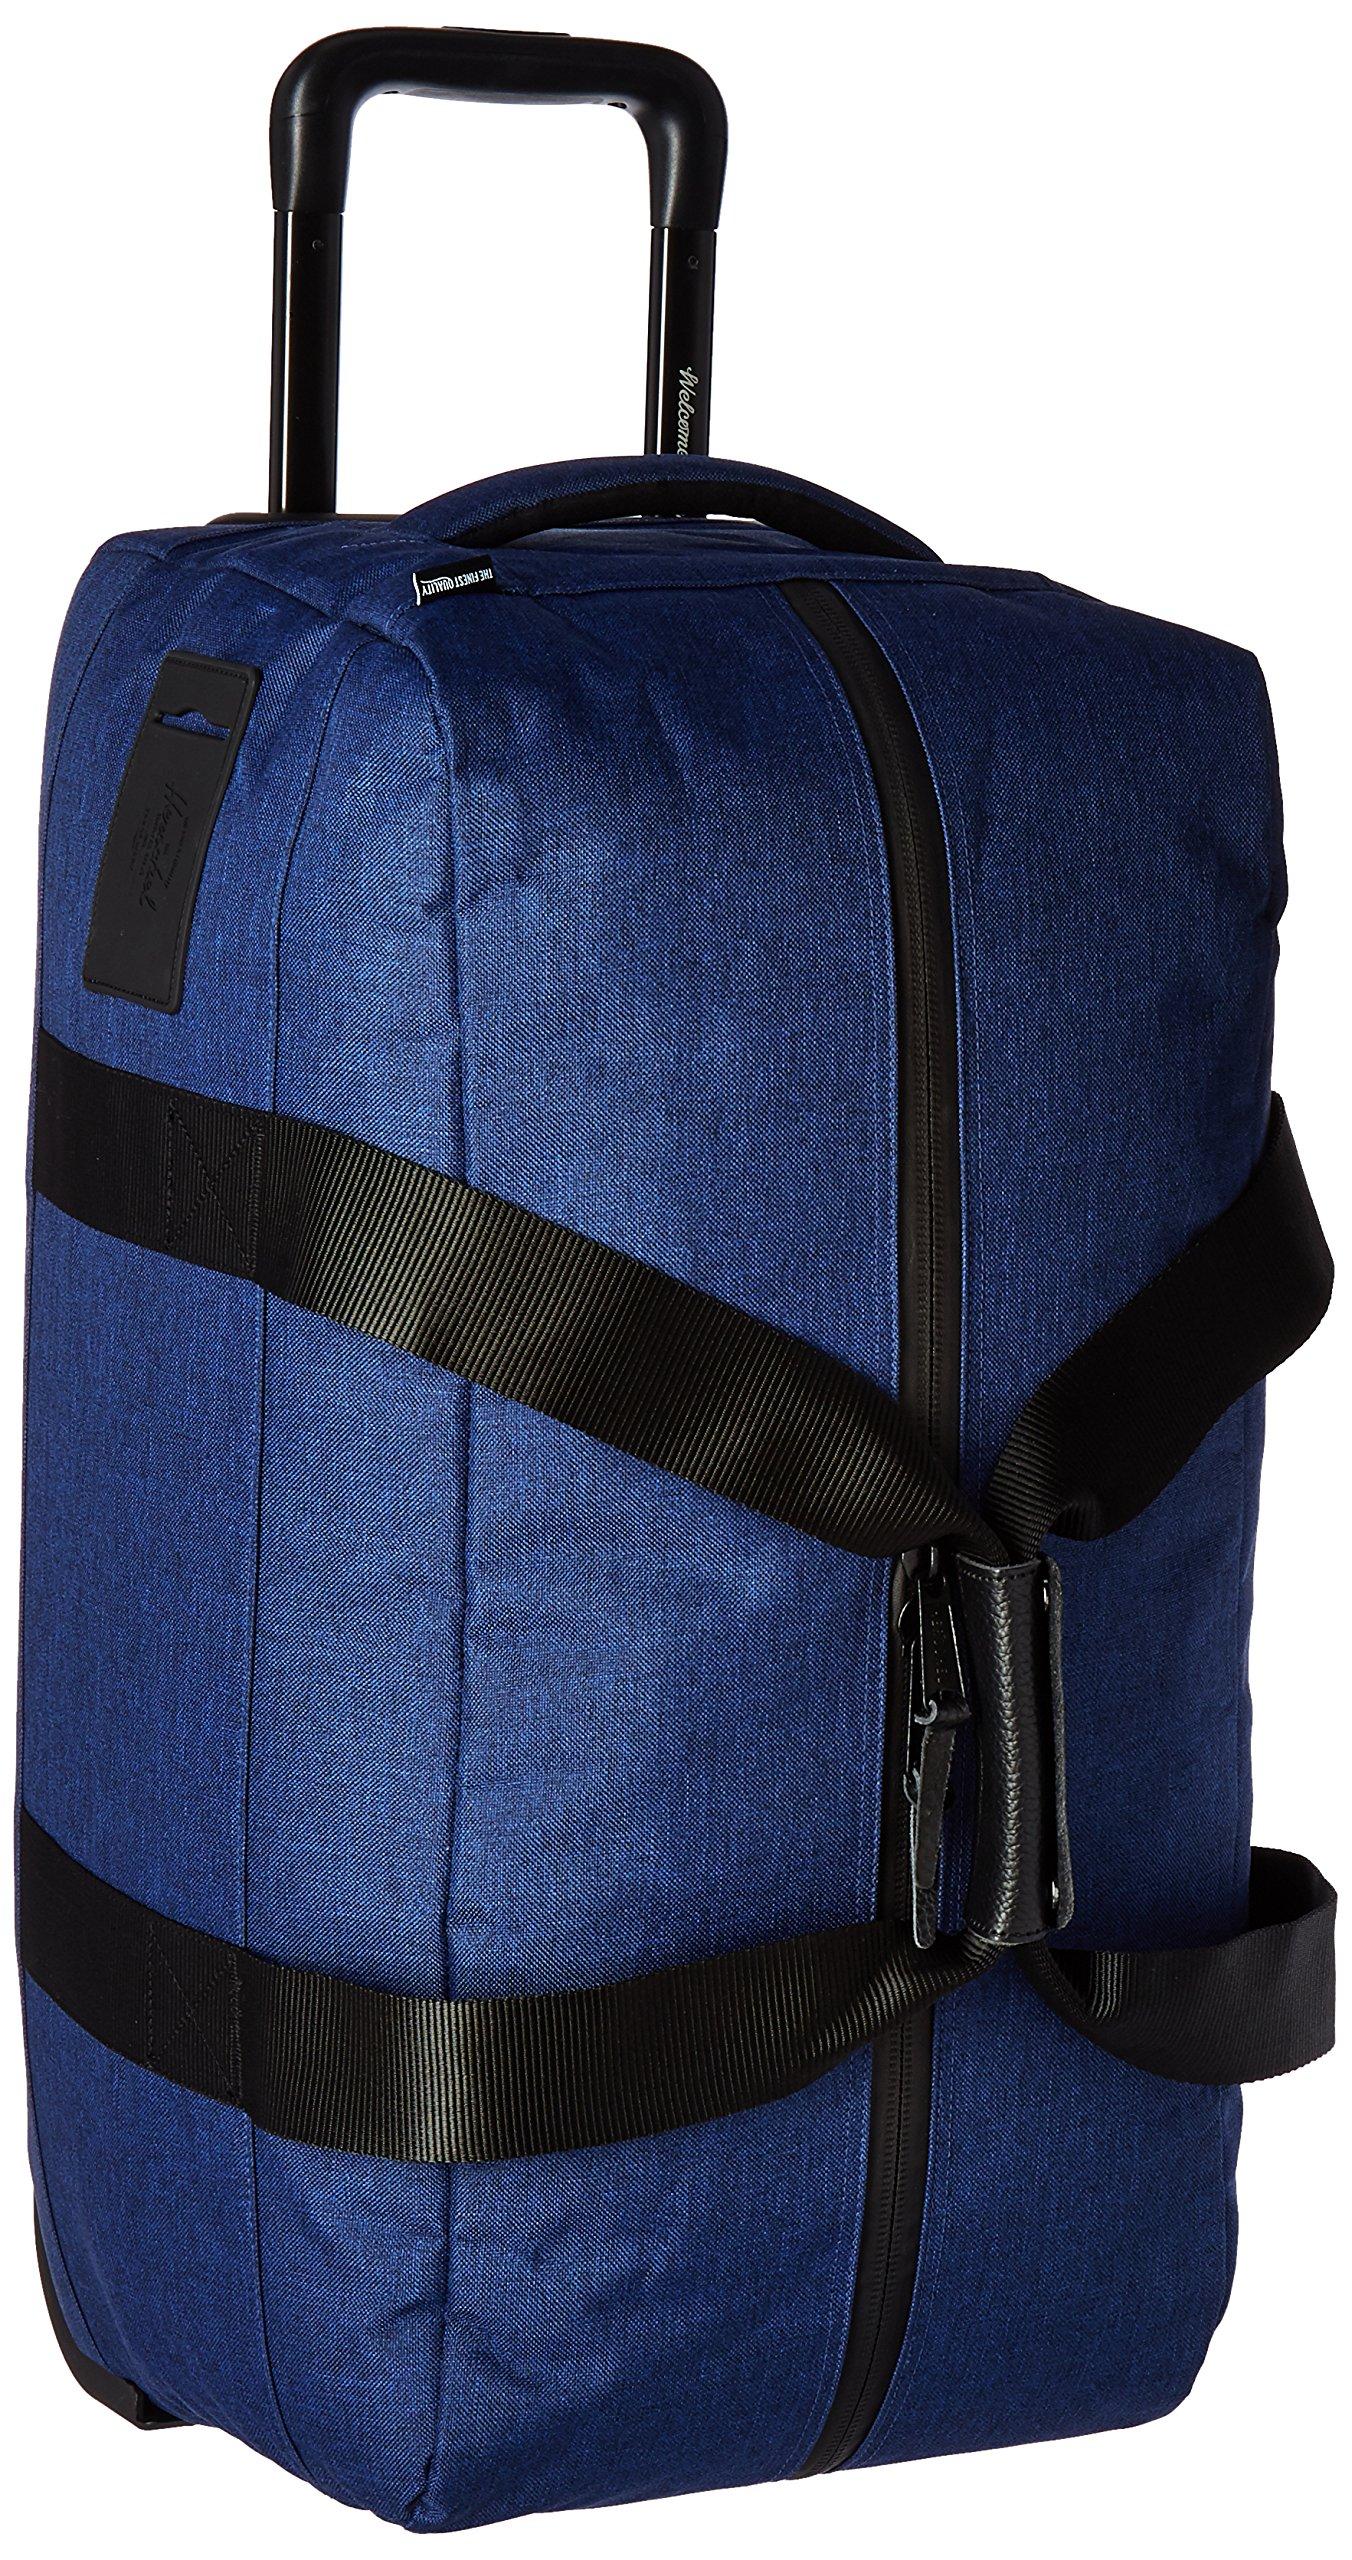 Herschel Supply Co. Wheelie Outfitter Duffle Bag, Eclipse Crosshatch by Herschel Supply Co.